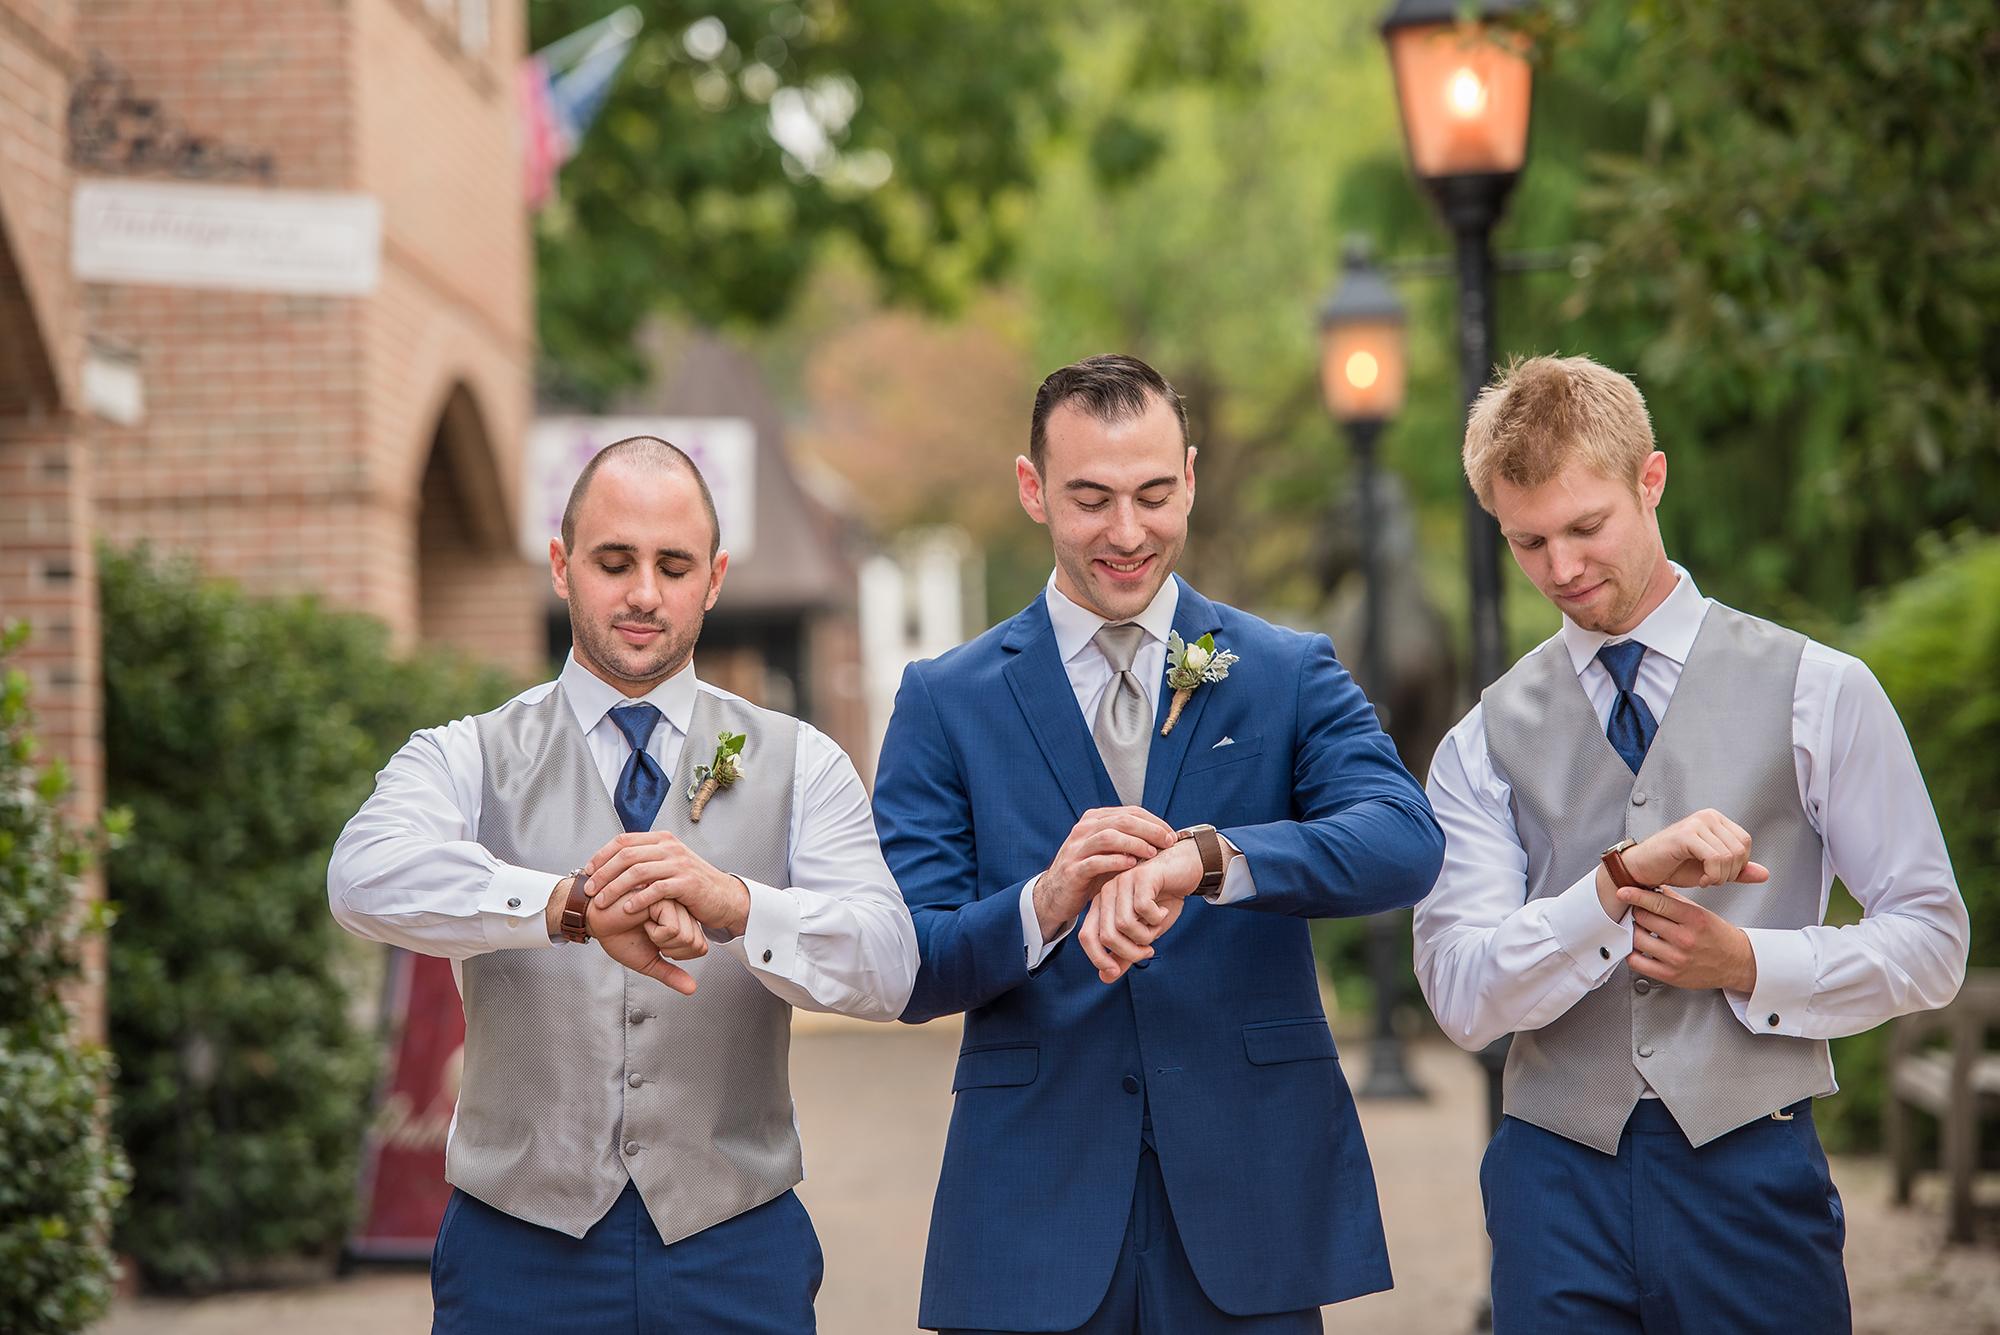 trenos-wedding-lbi-photographer-41.jpg